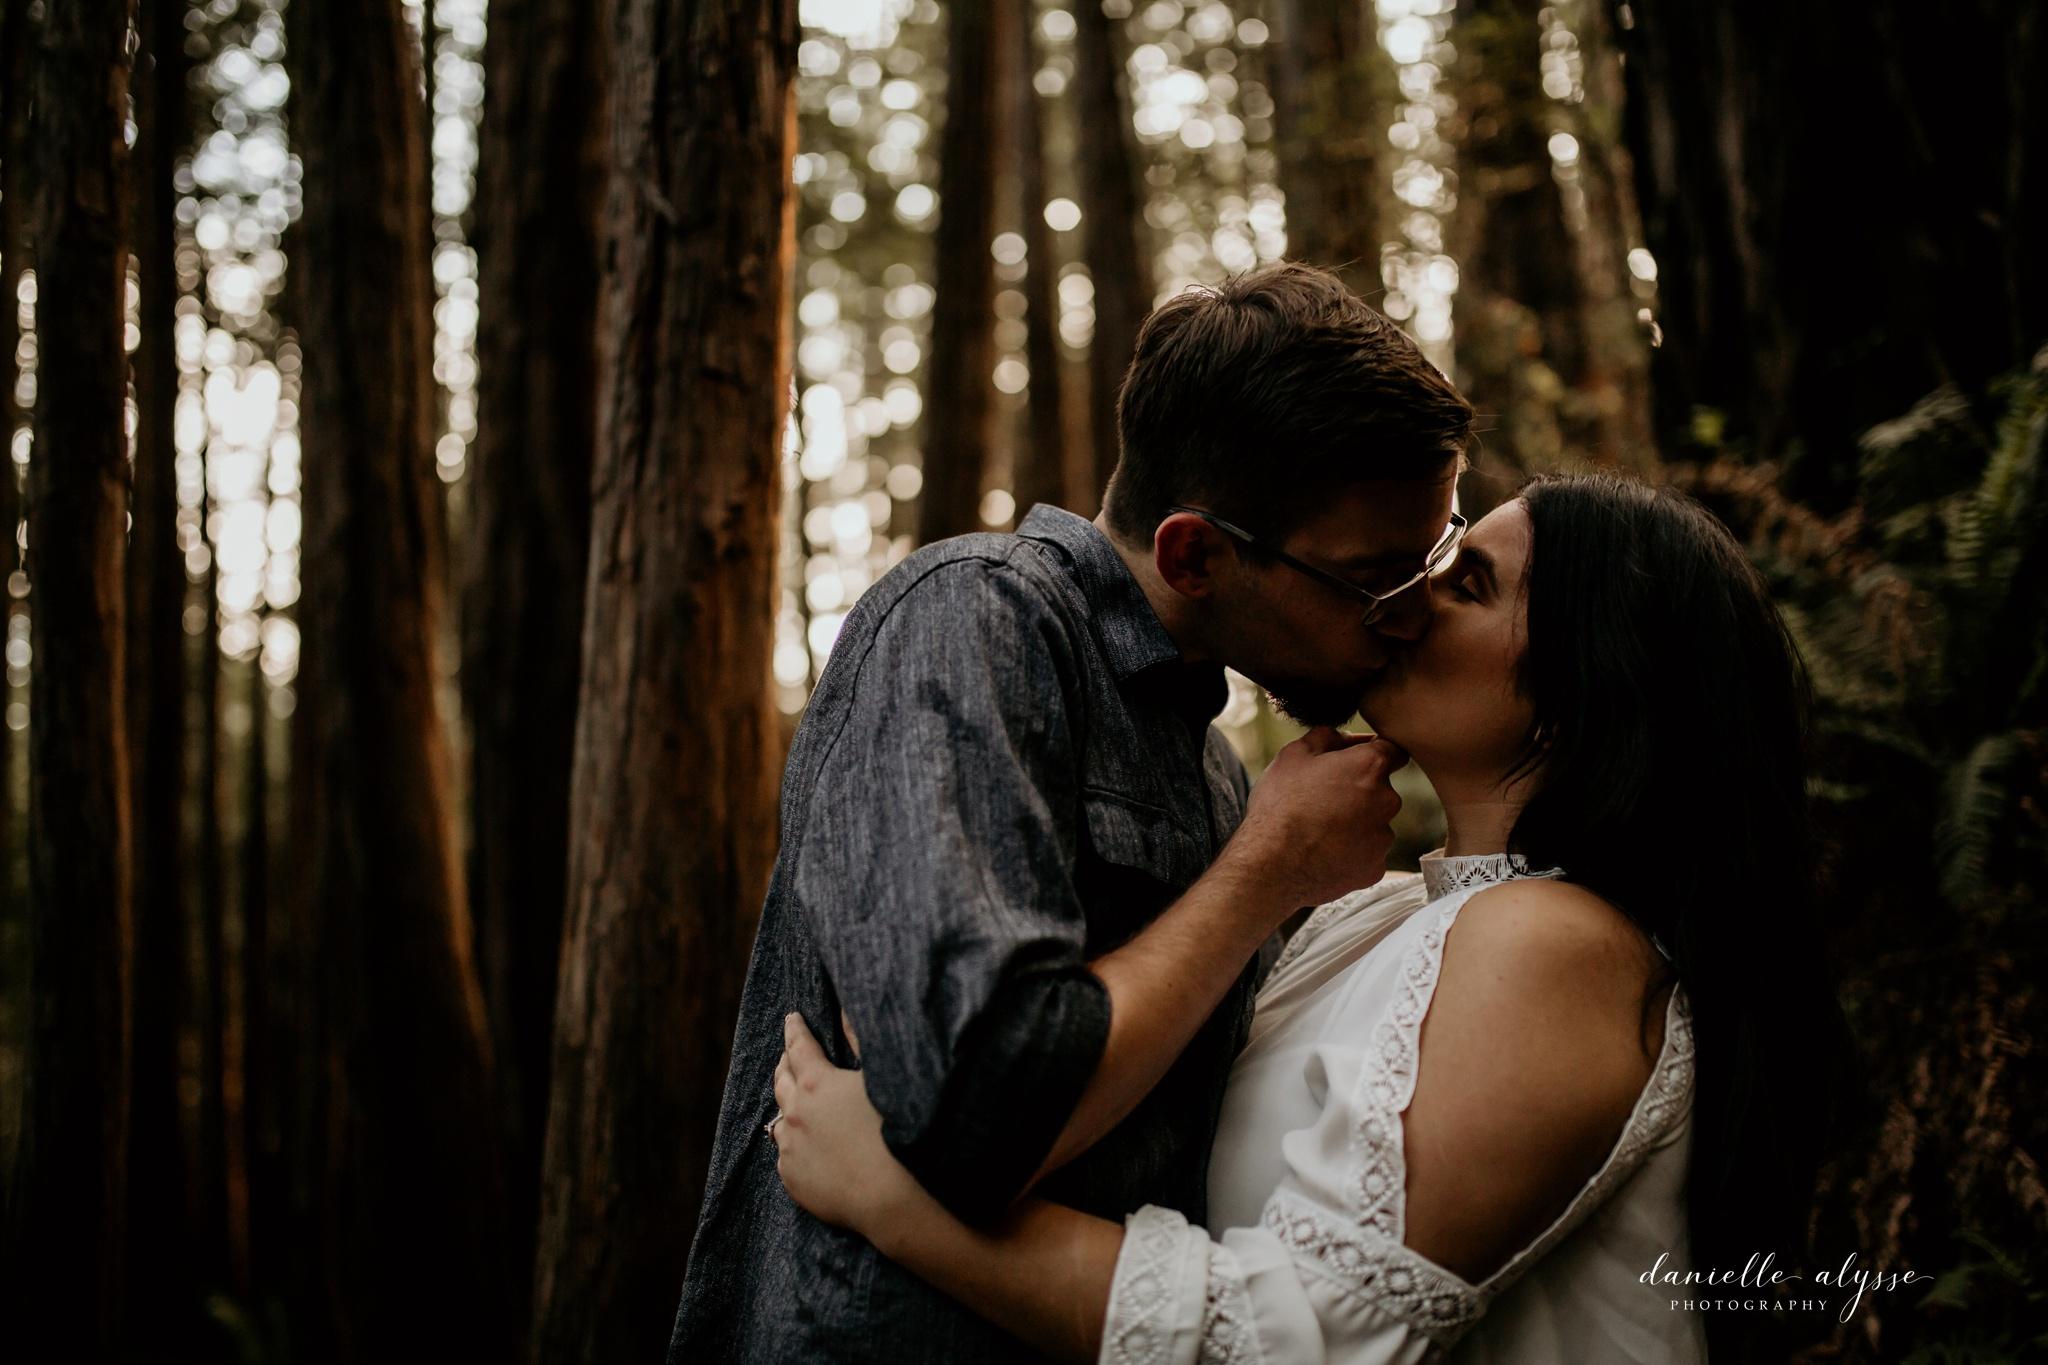 180503_engagement_bianca_muir_woods_mill_valley_danielle_alysse_photography_bay_area_photographer_blog_45_WEB.jpg